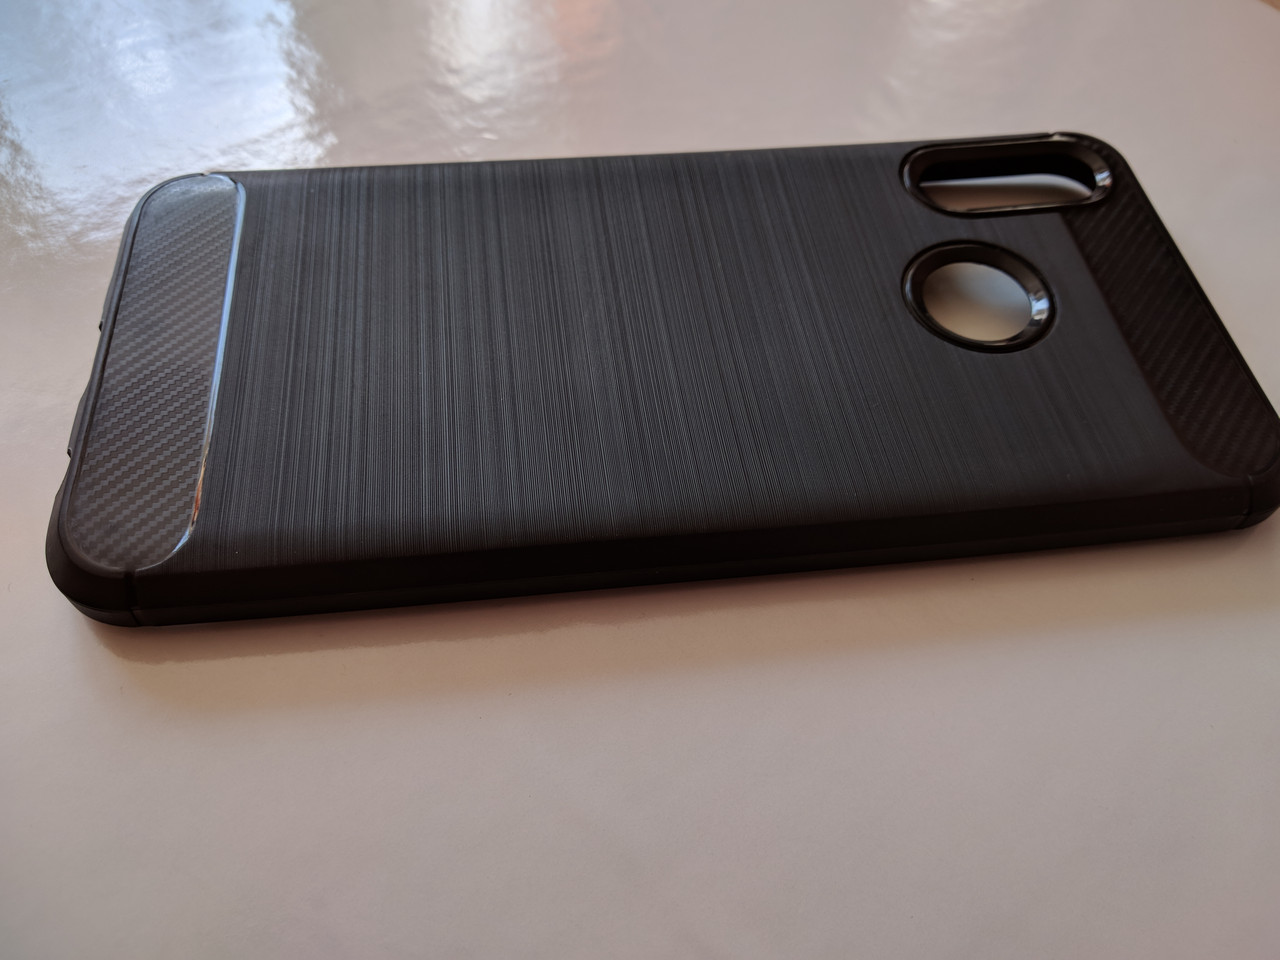 Протиударний чохол на Huawei NOVA 3.